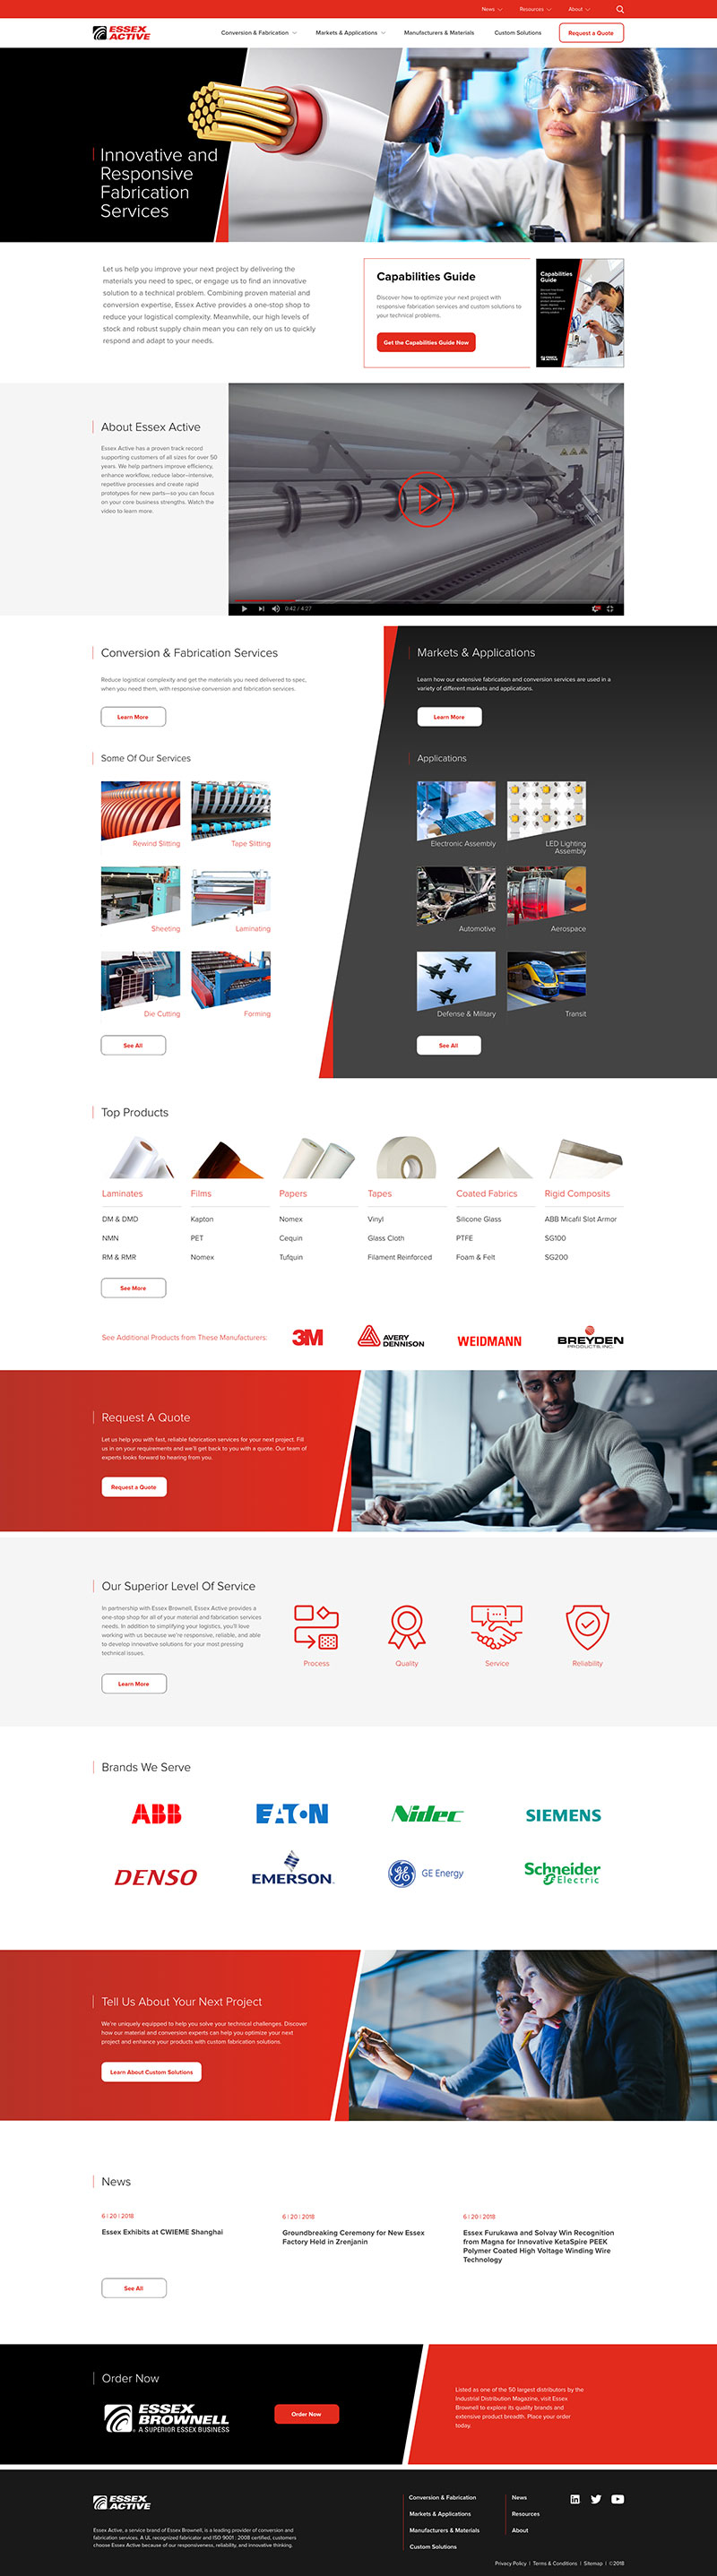 Essex Active Homepage Mockup